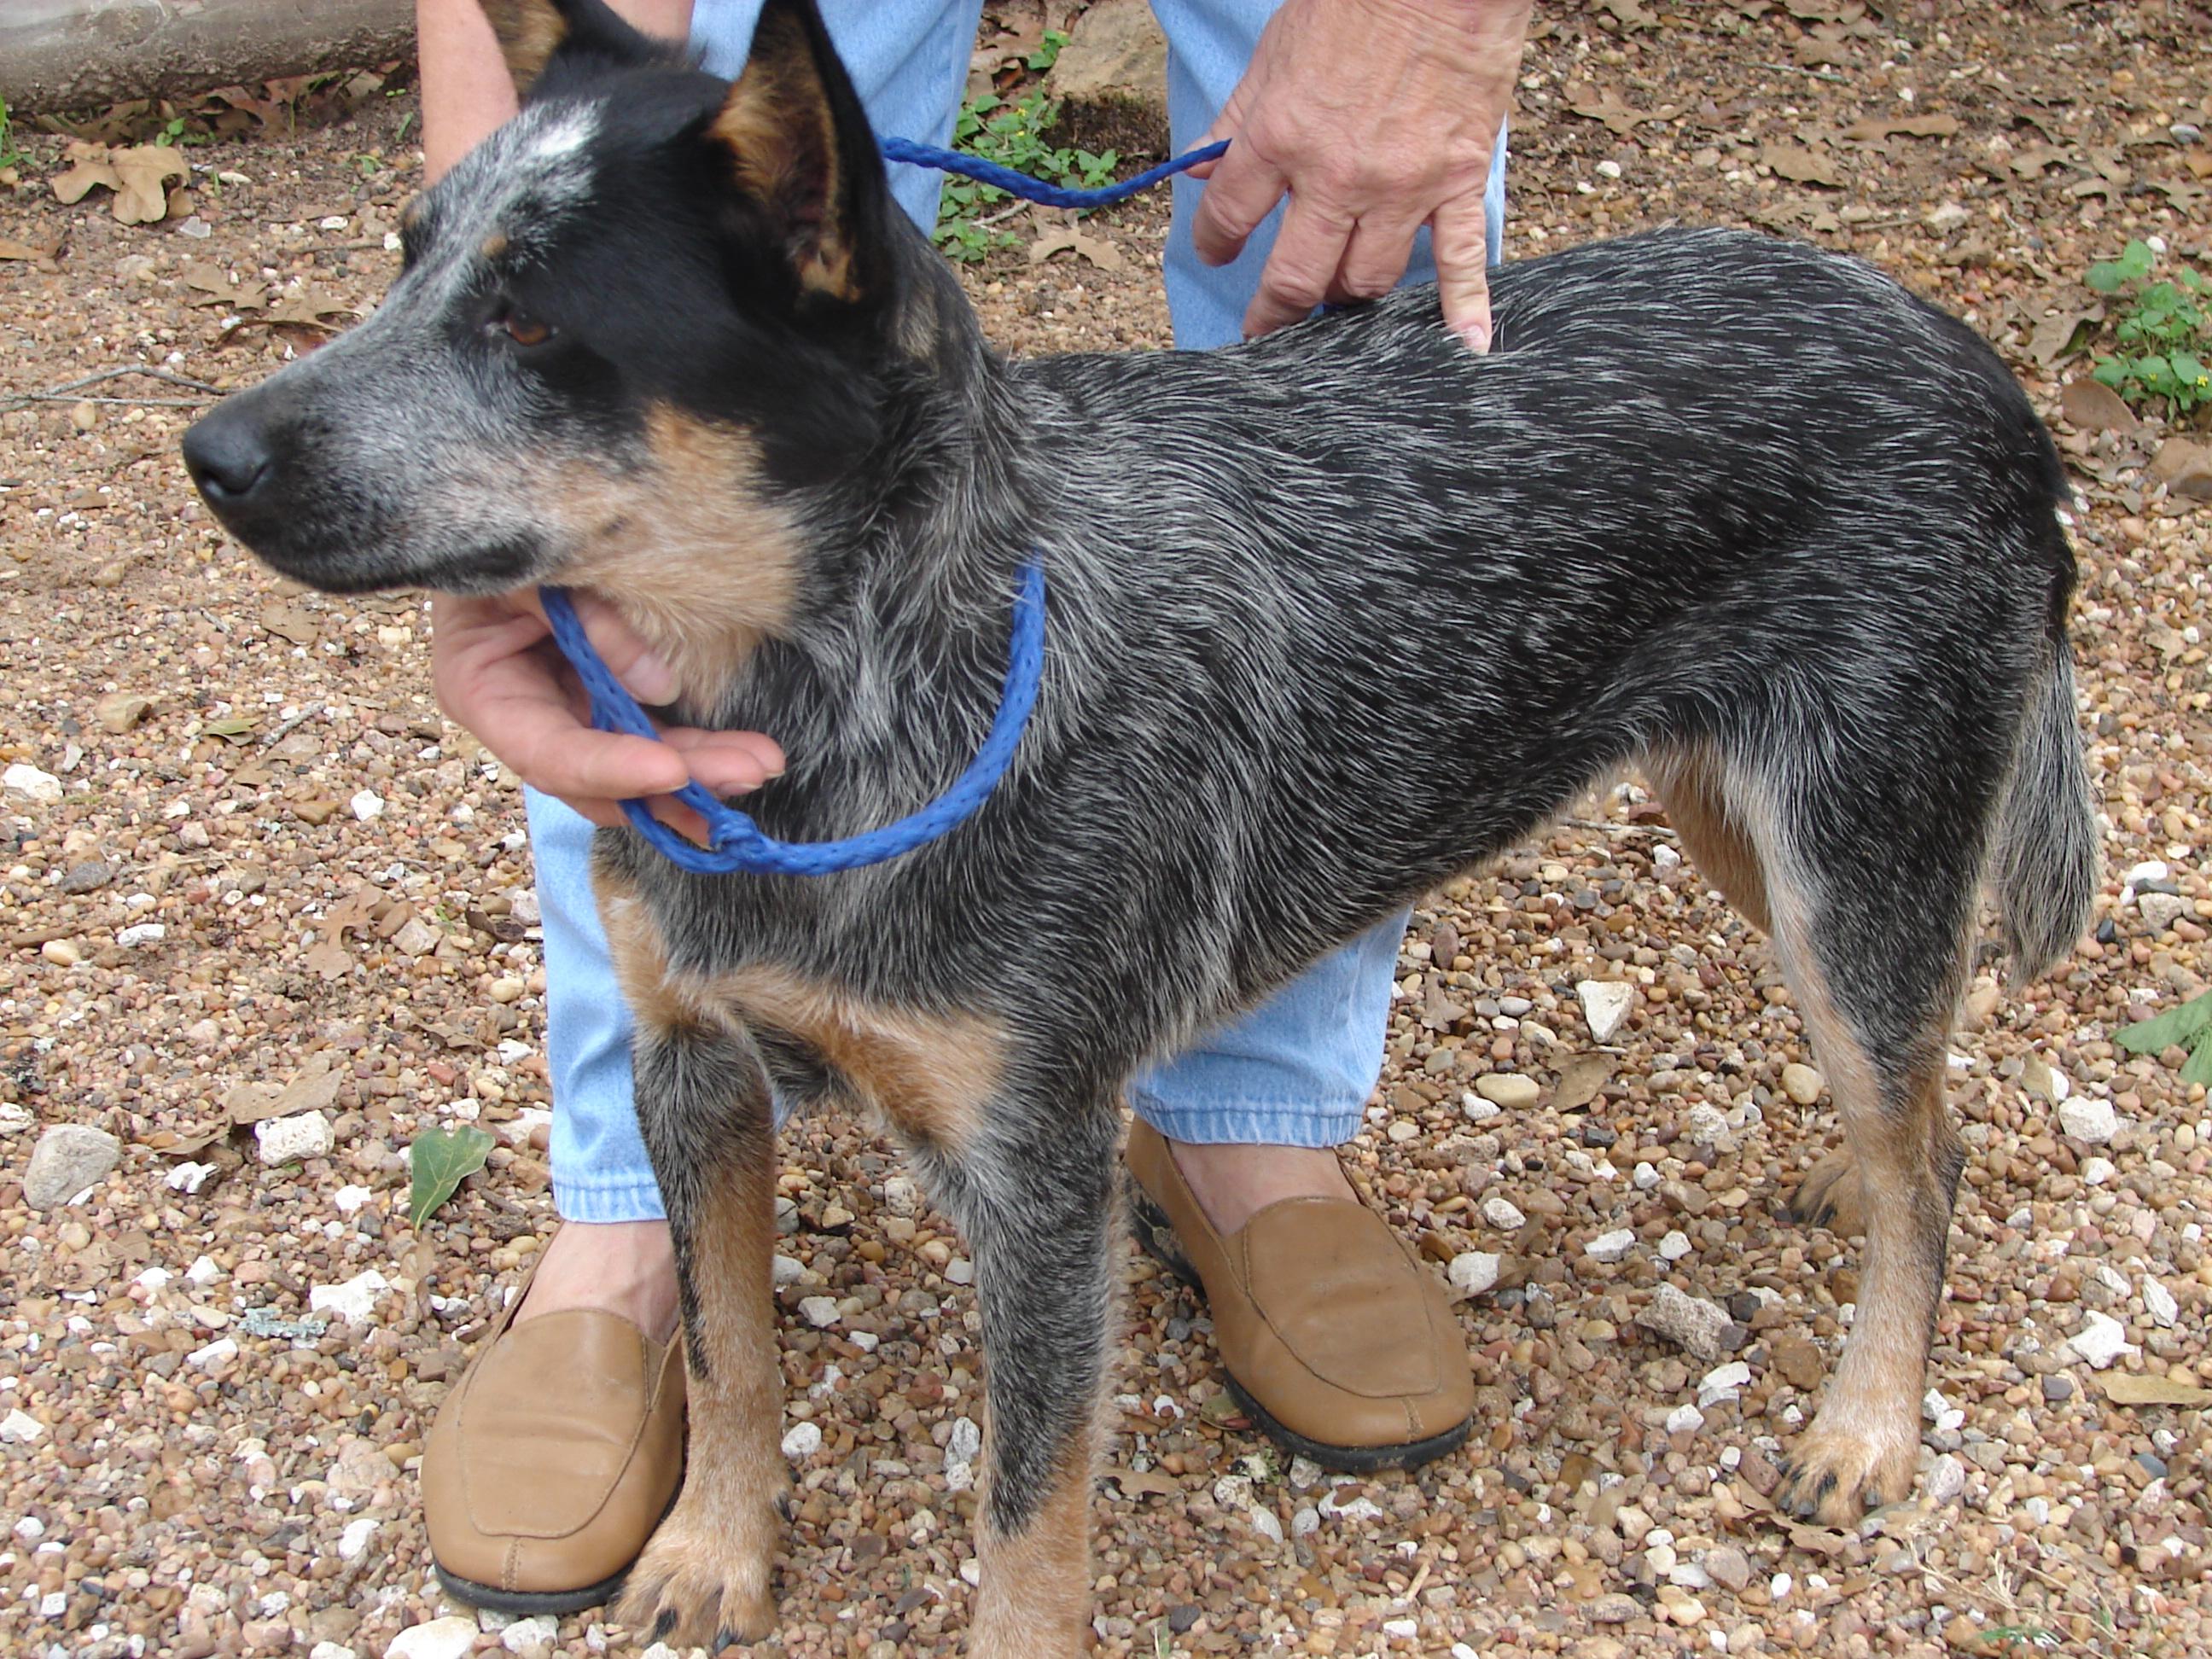 1 Year Female Beagle Cross Dog For Adoption: PAAWS-tx.org [Pet Adoption And Animal Welfare Society]